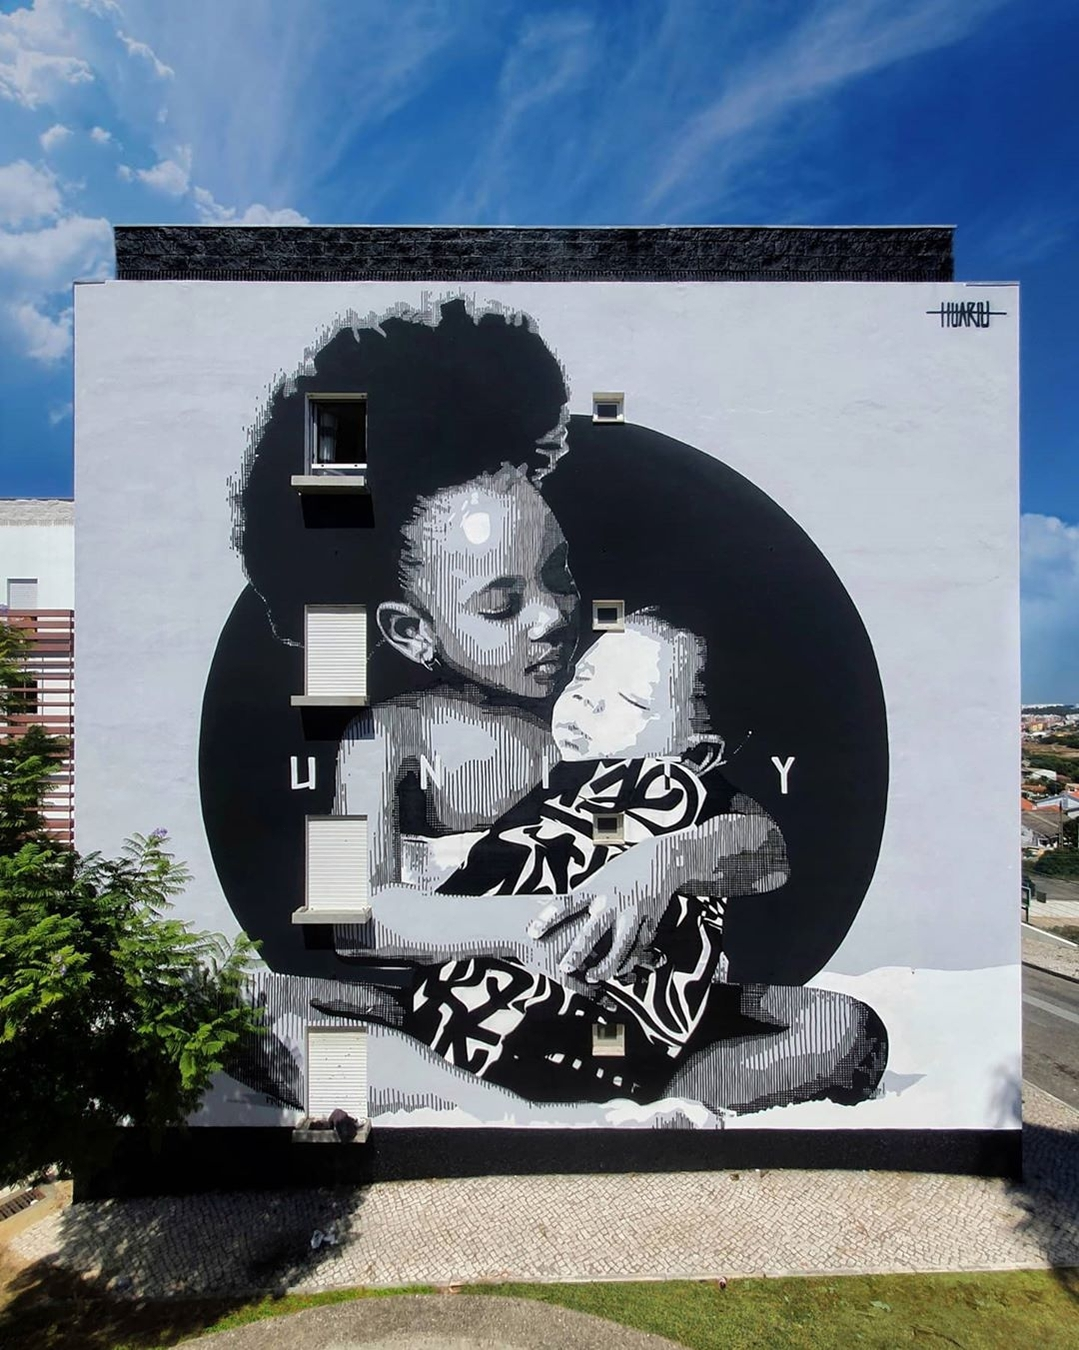 Huariu @ Lisbon, Portugal